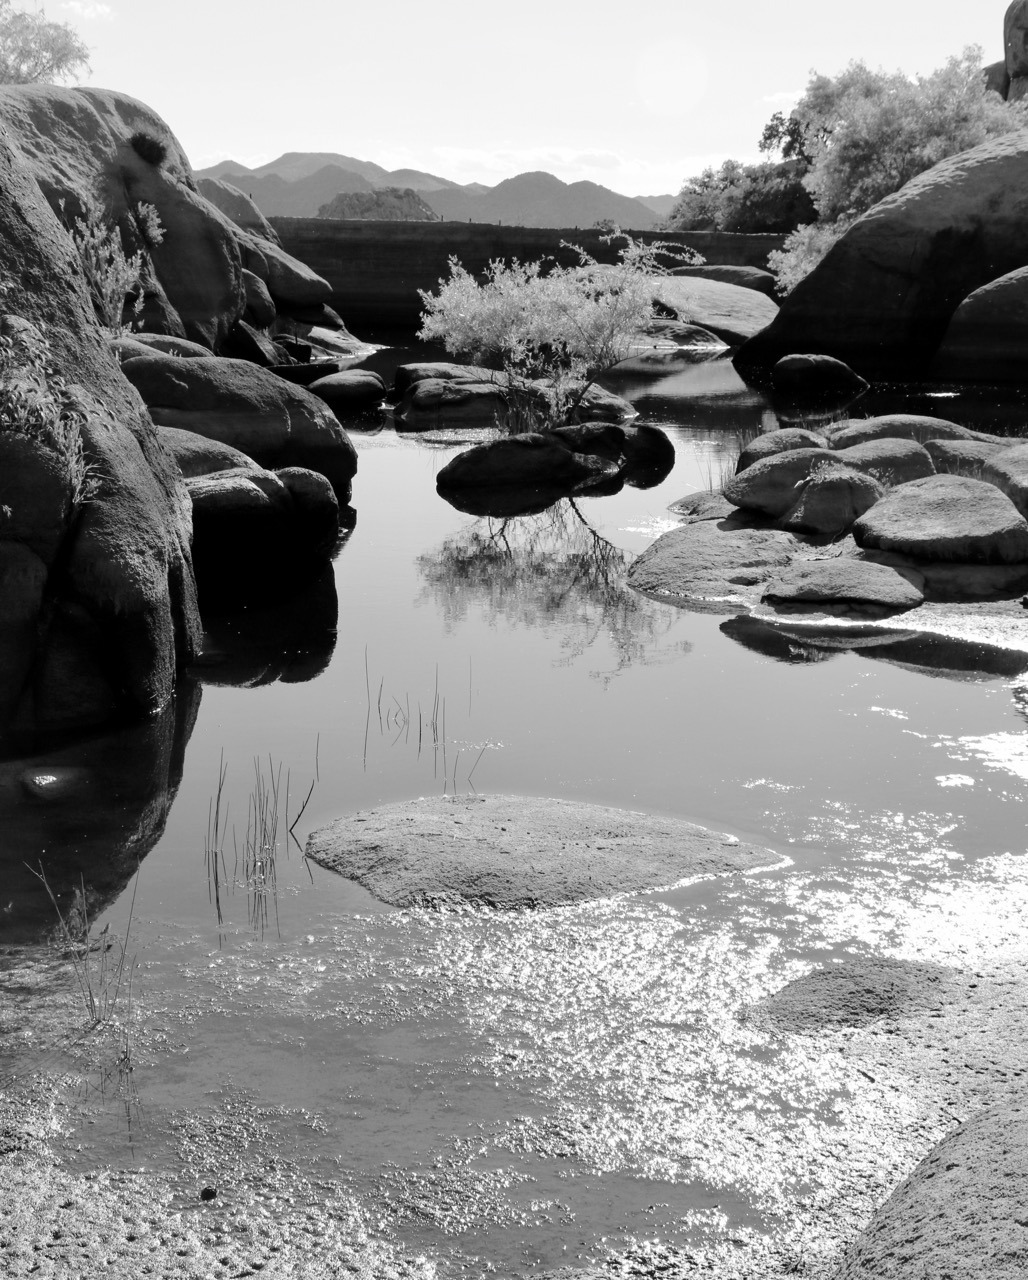 Reflections, Water in the Desert - Barker dam, Joshua Tree National Park